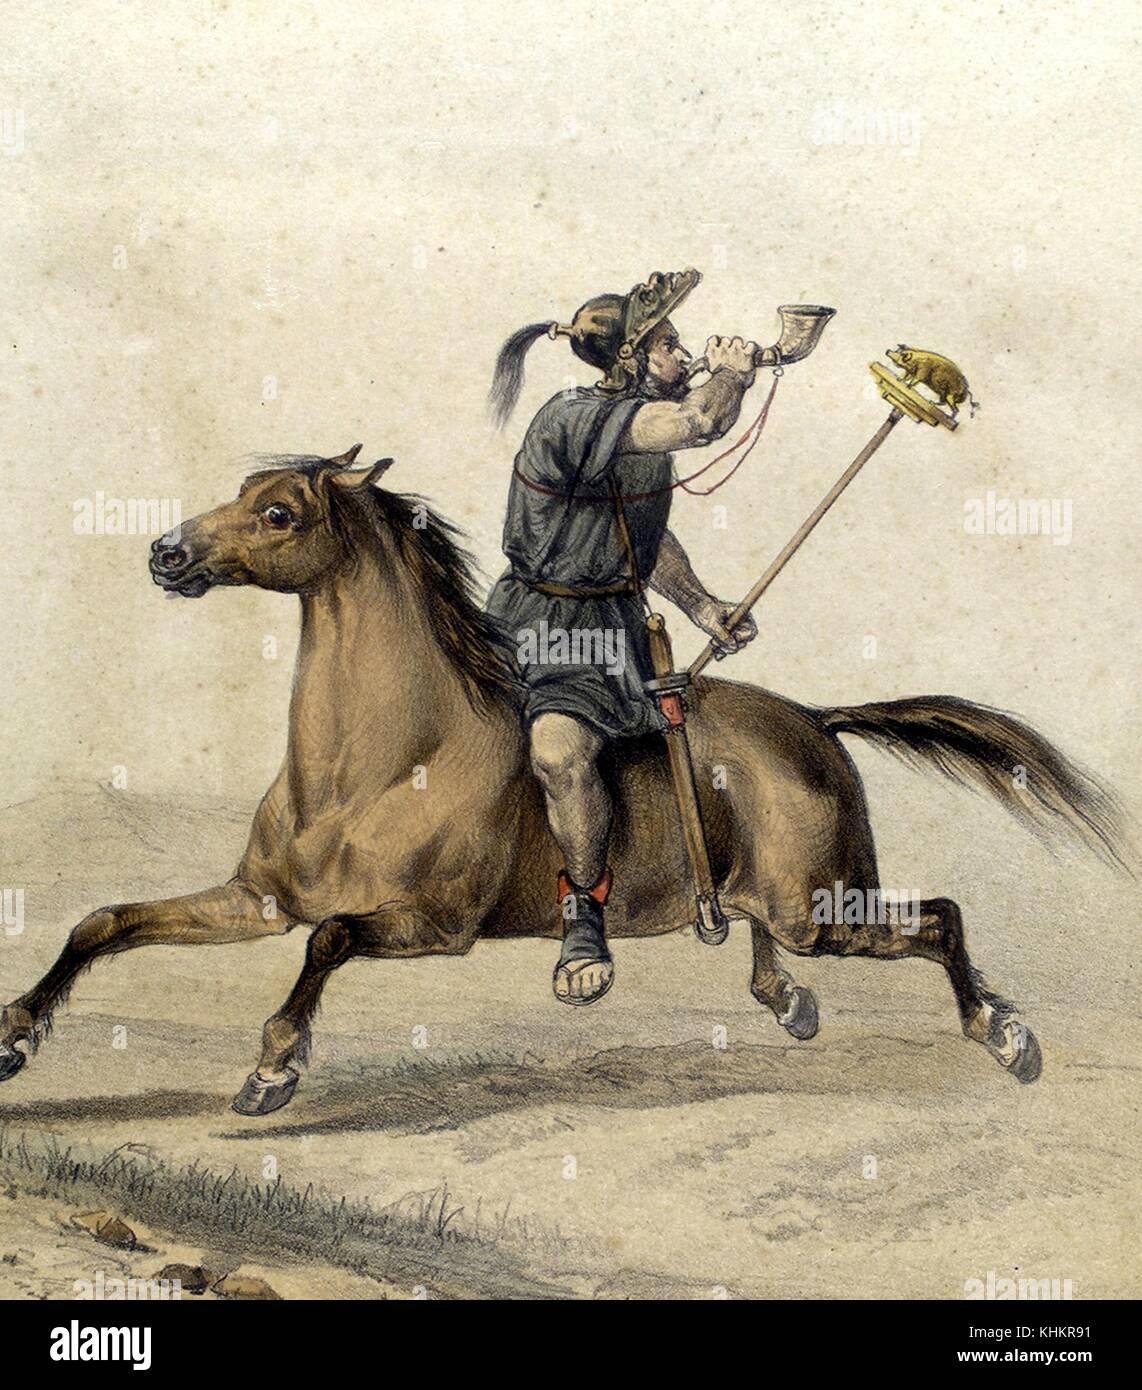 Color lithograph depicting a primitive cavalry Celtibero, members of a pre-Roman Hispanic settlement established - Stock Image